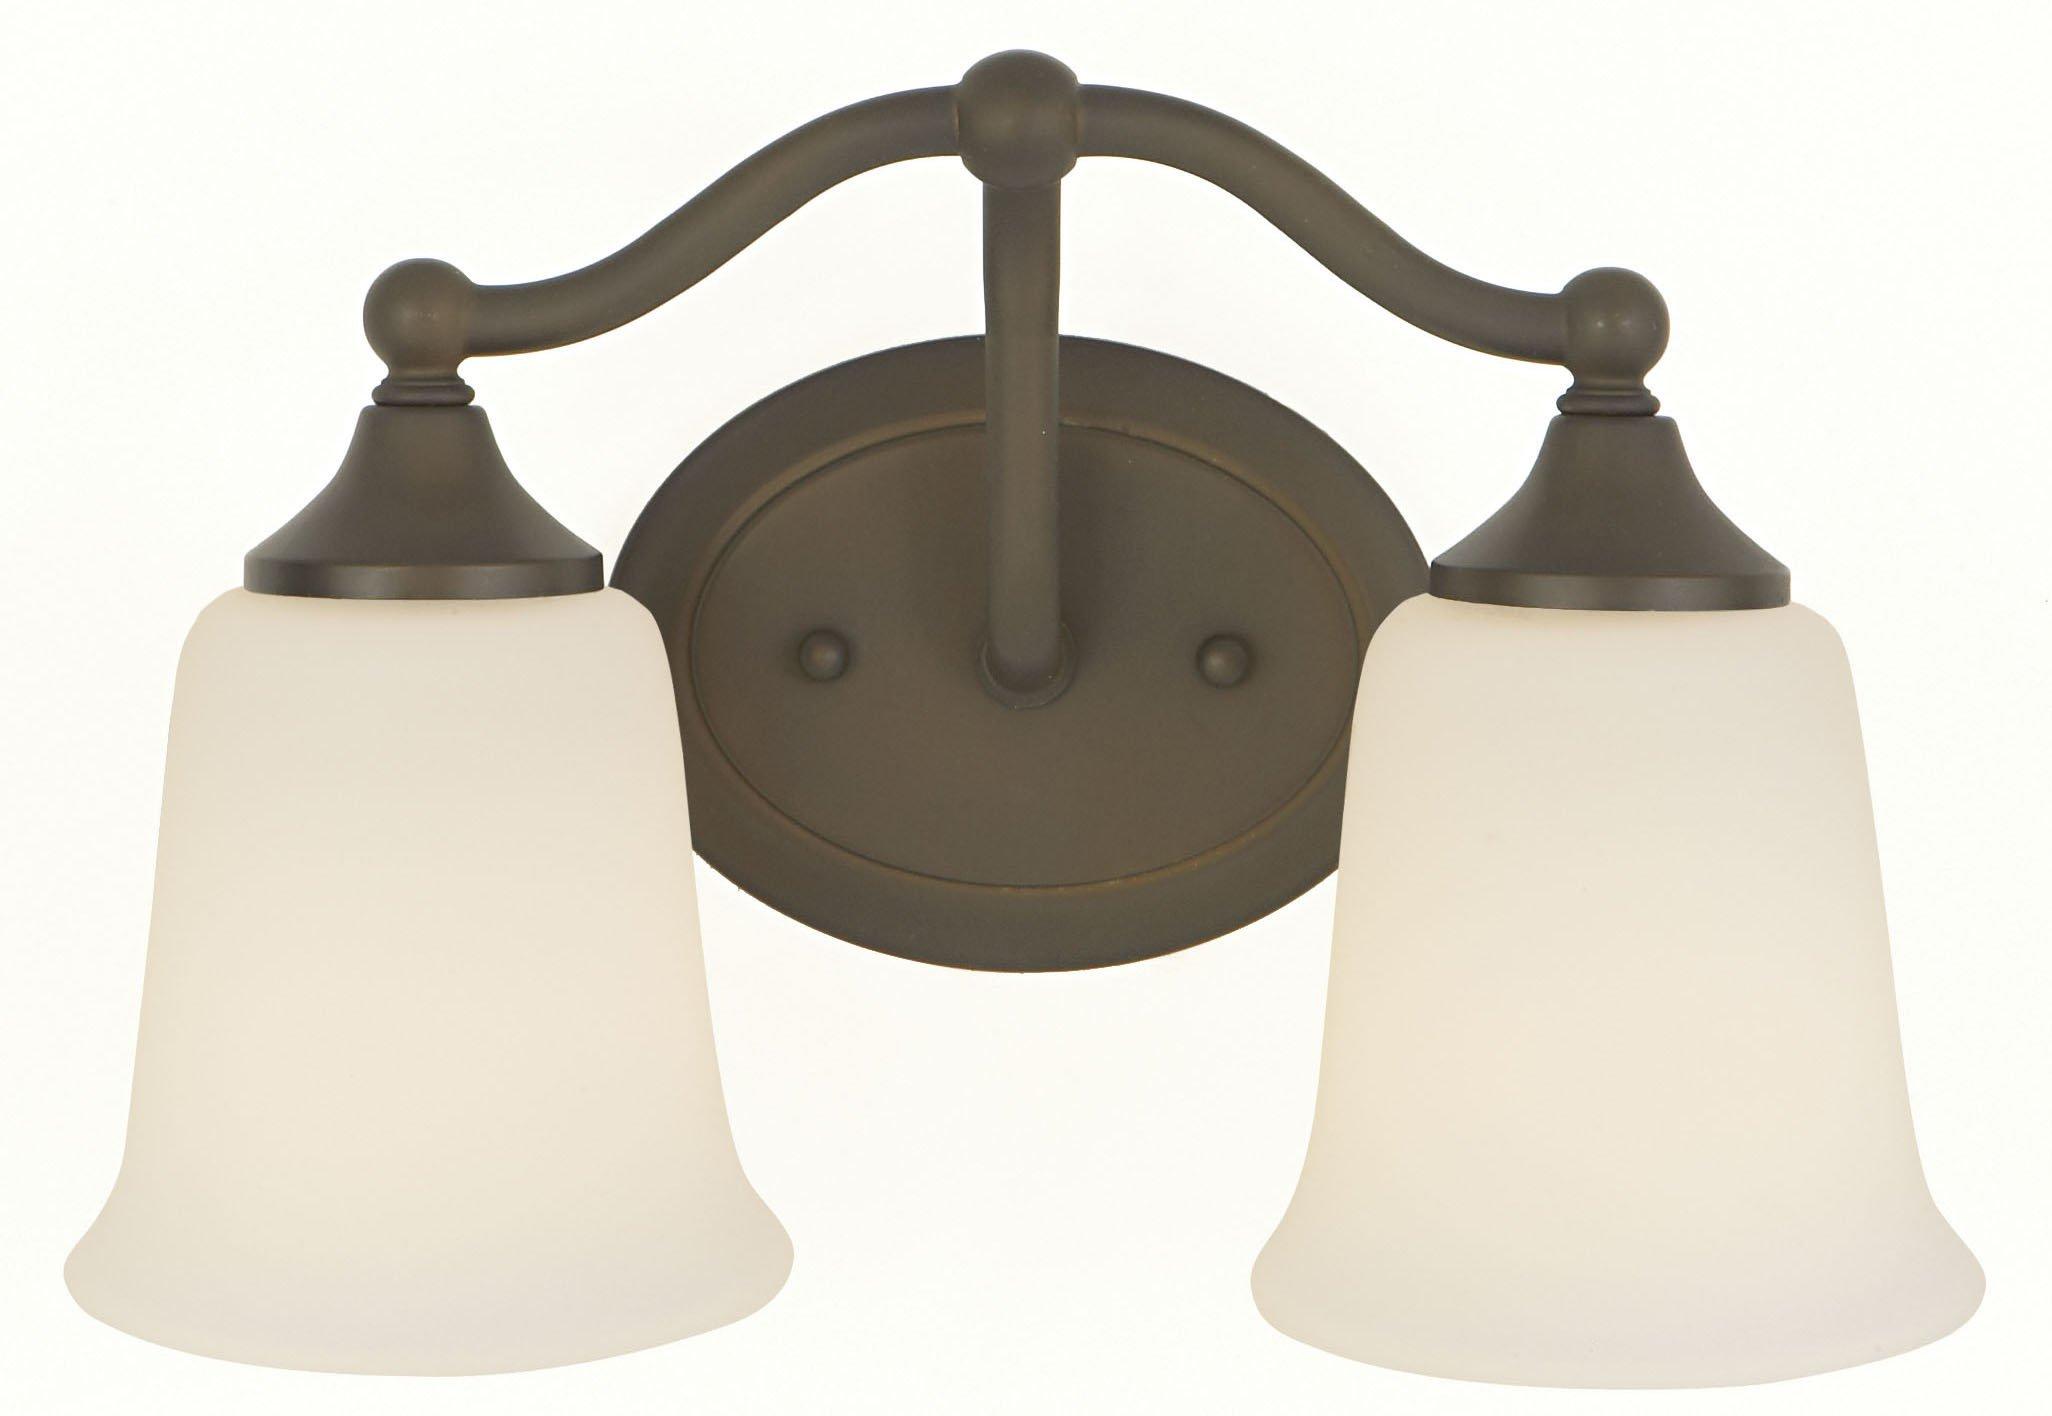 Feiss VS10502-ORB Claridge Glass Wall Vanity Bath Lighting, Bronze, 2-Light (13''W x 8''H) 200watts